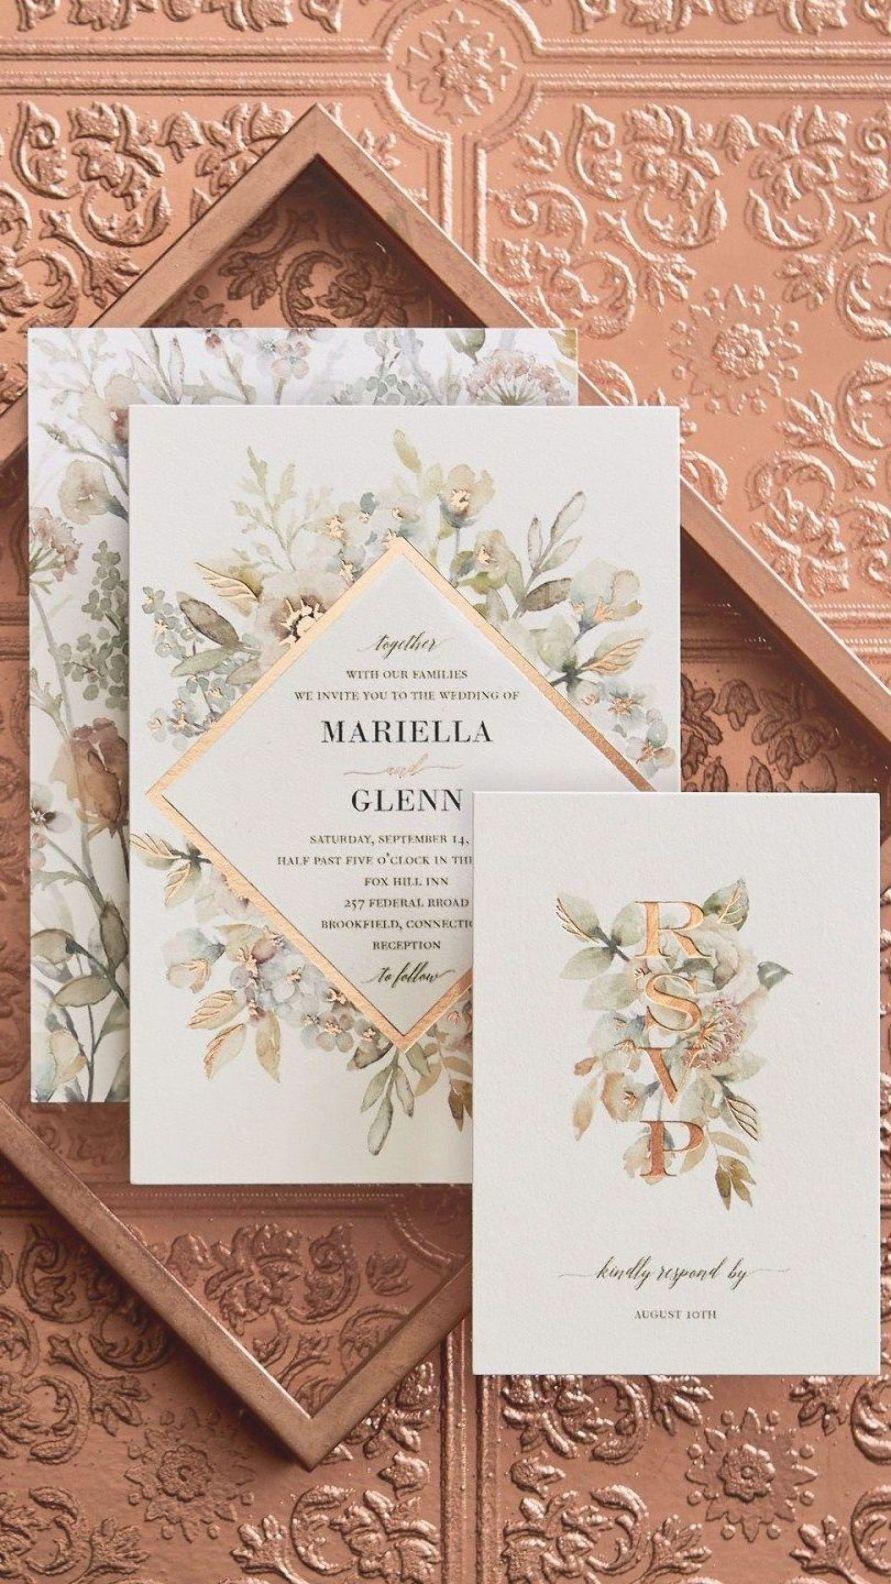 32 Beautiful Image Of Amazing Wedding Invitations Amazing Wedding Invitations Gorgeous Wedding Invitations With Copper I 2020 Bryllupsinvitation Invitationer Bryllup